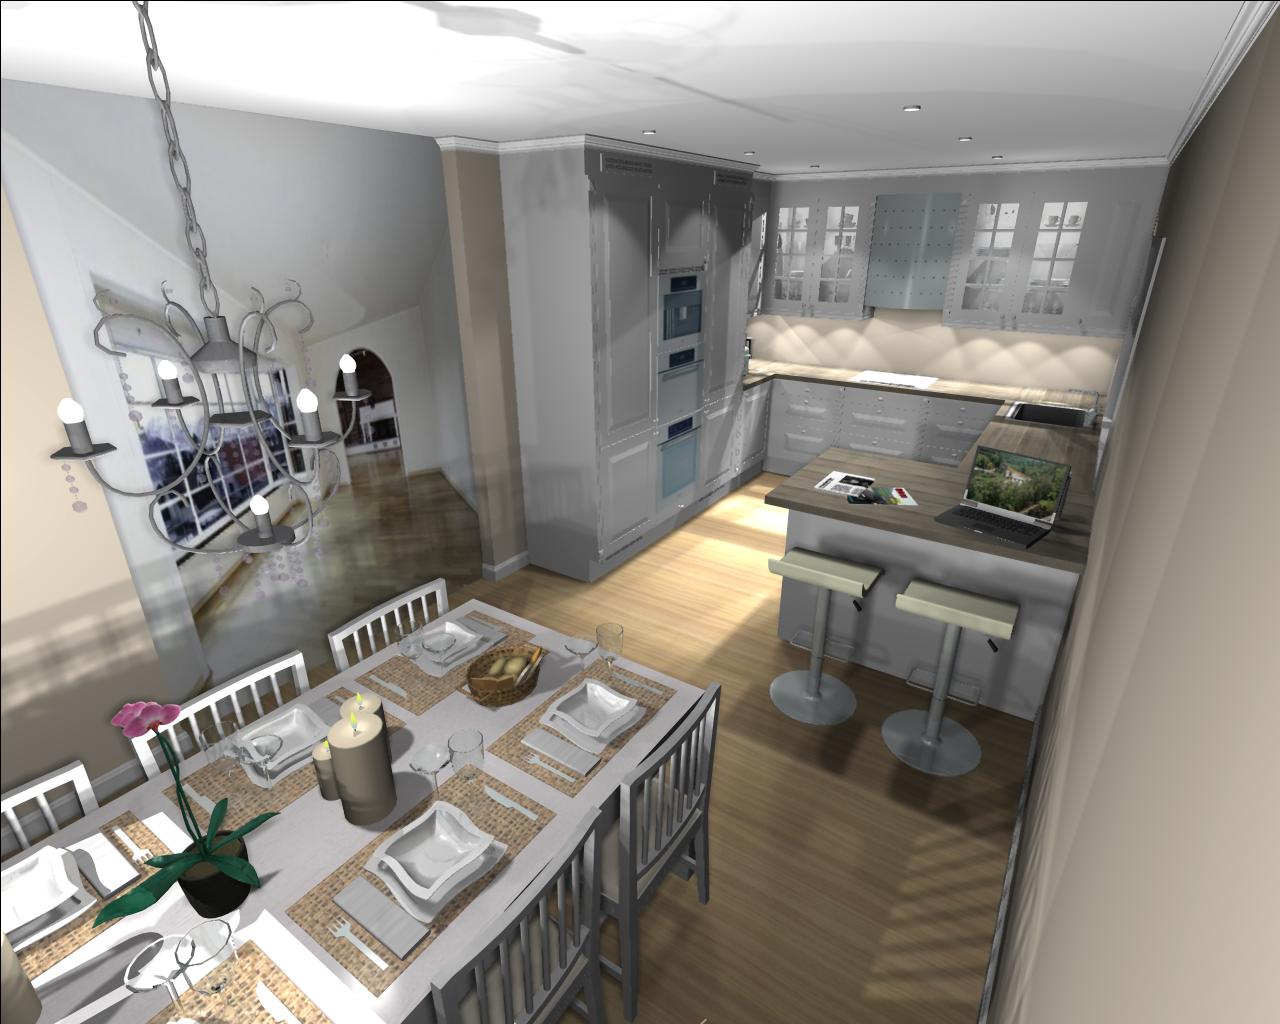 Kjøkken Liten Plass – AsTriC